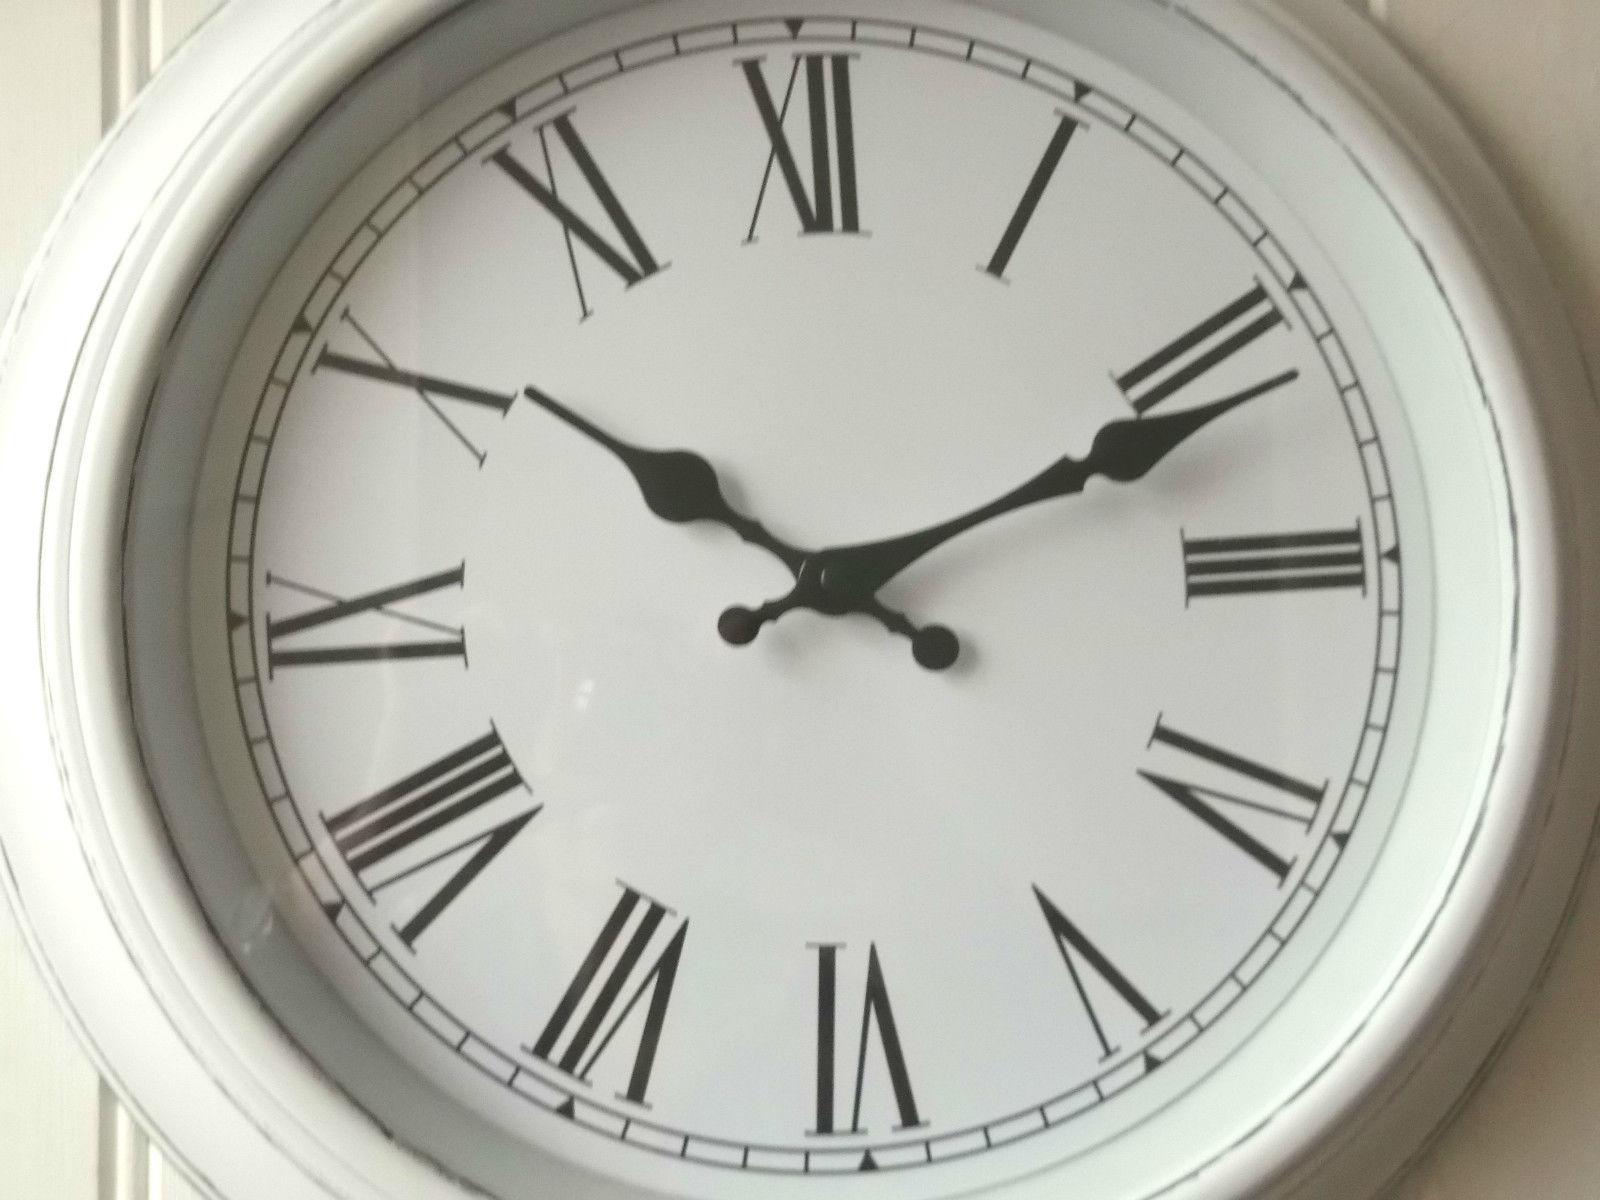 Shabby Chic Large White Wall Clock Amazing Grace Interiors